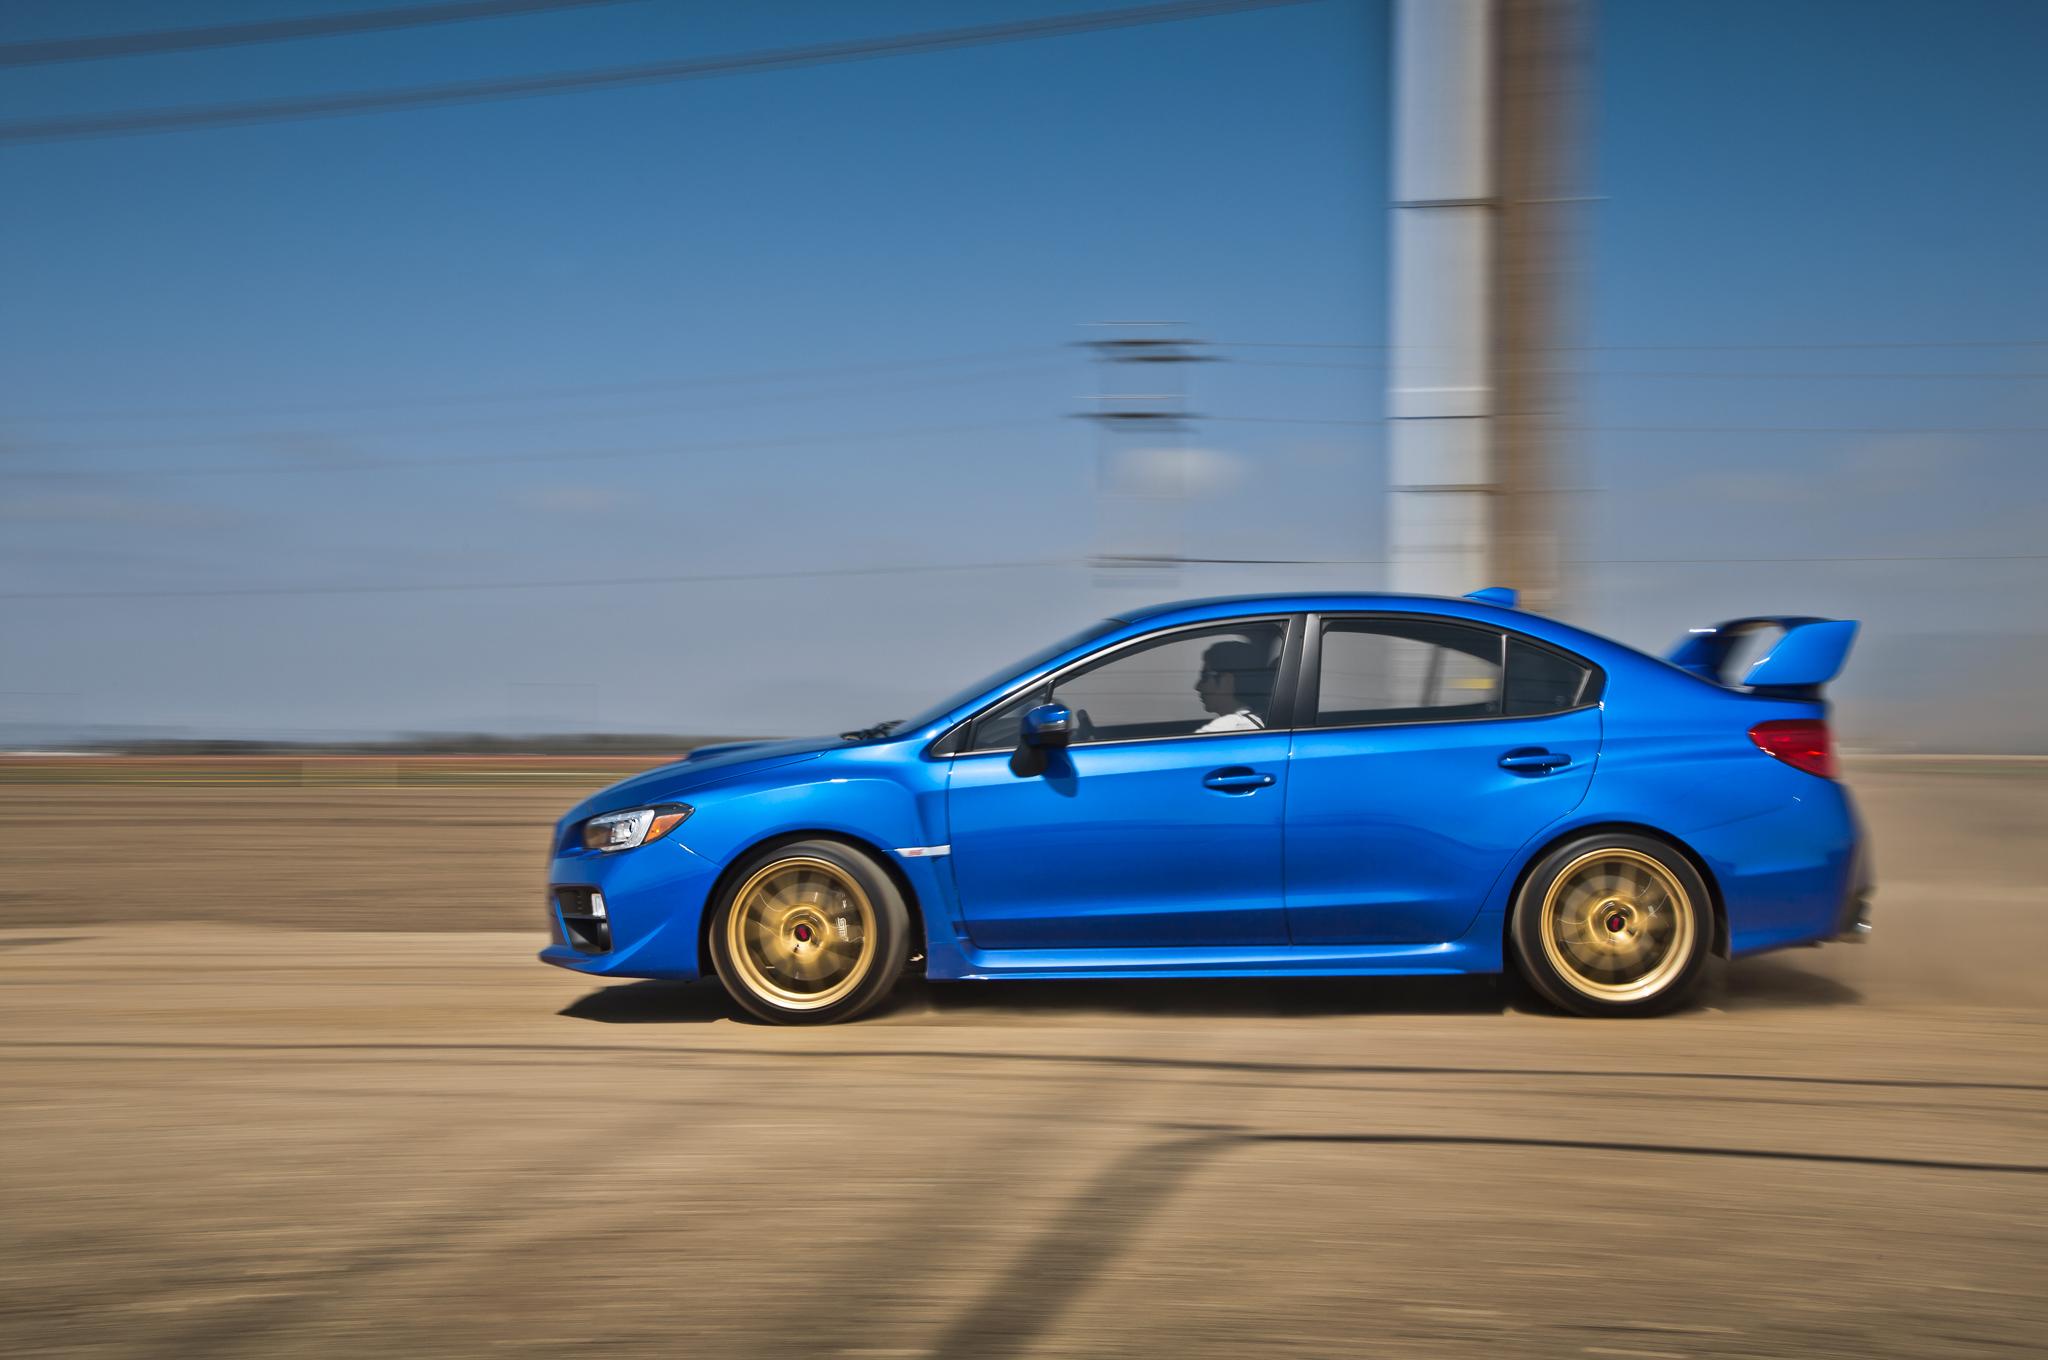 2015 Subaru WRX-STI Drive Performance